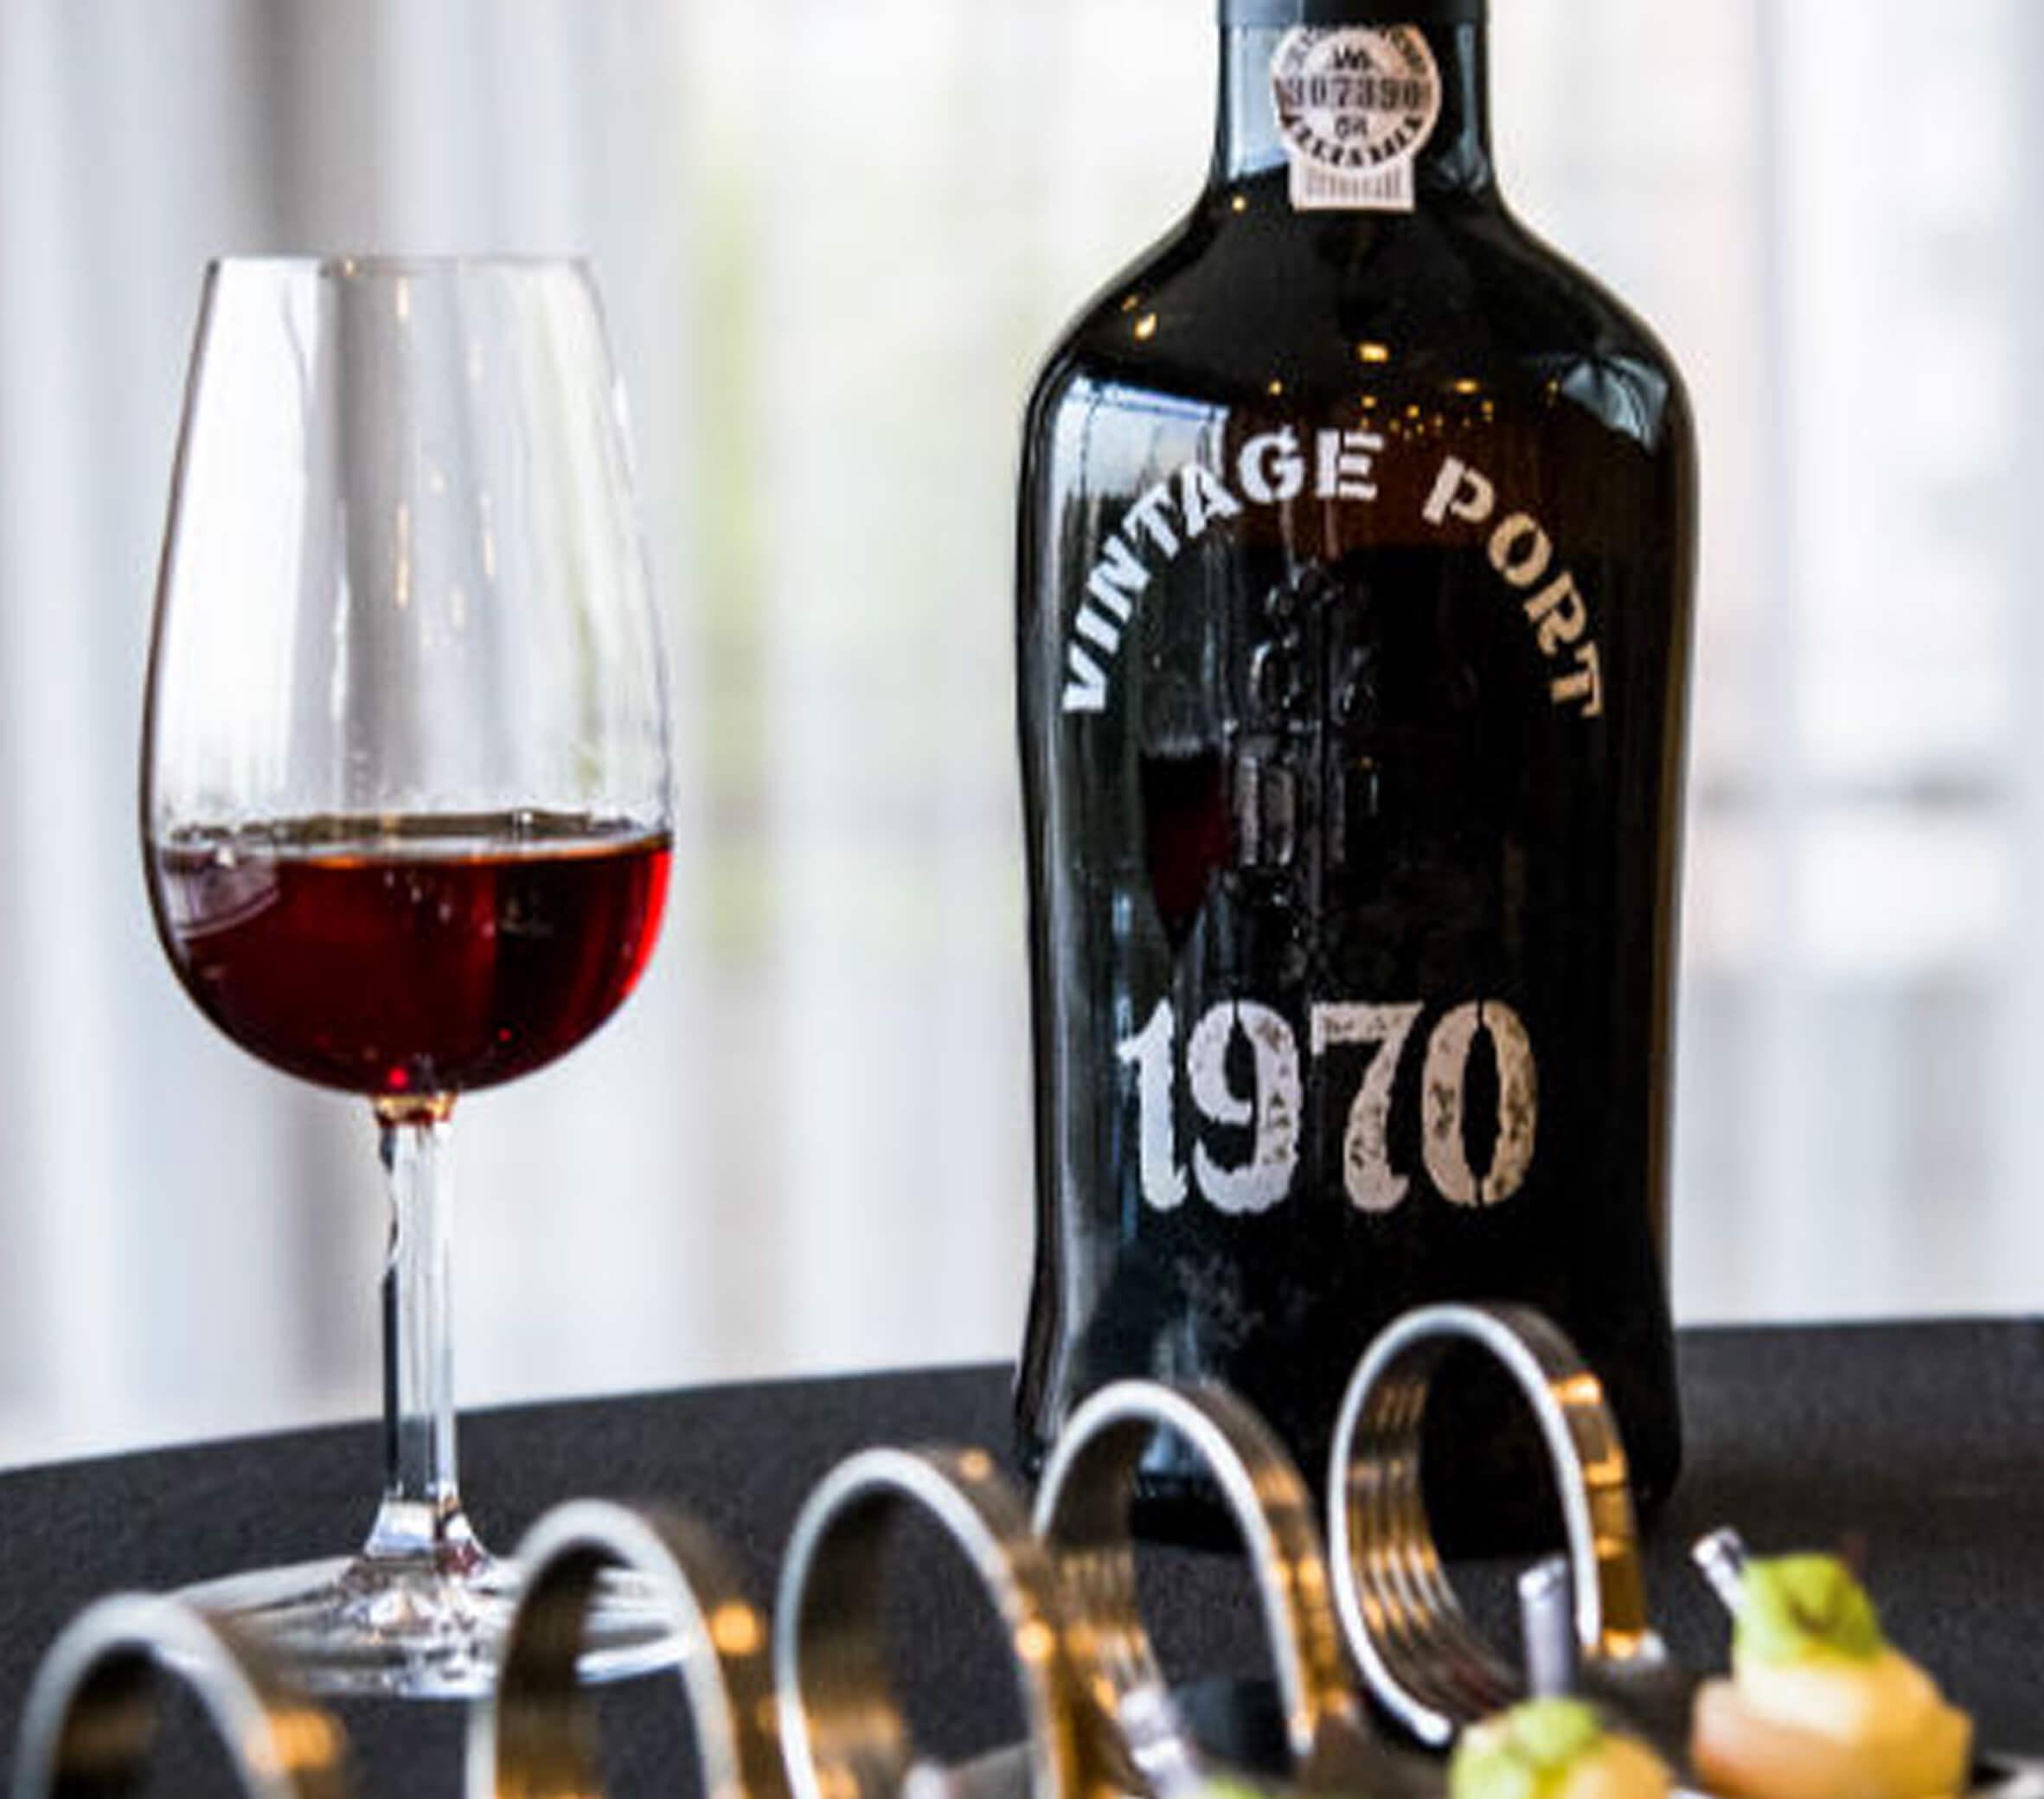 Porto quality red wines